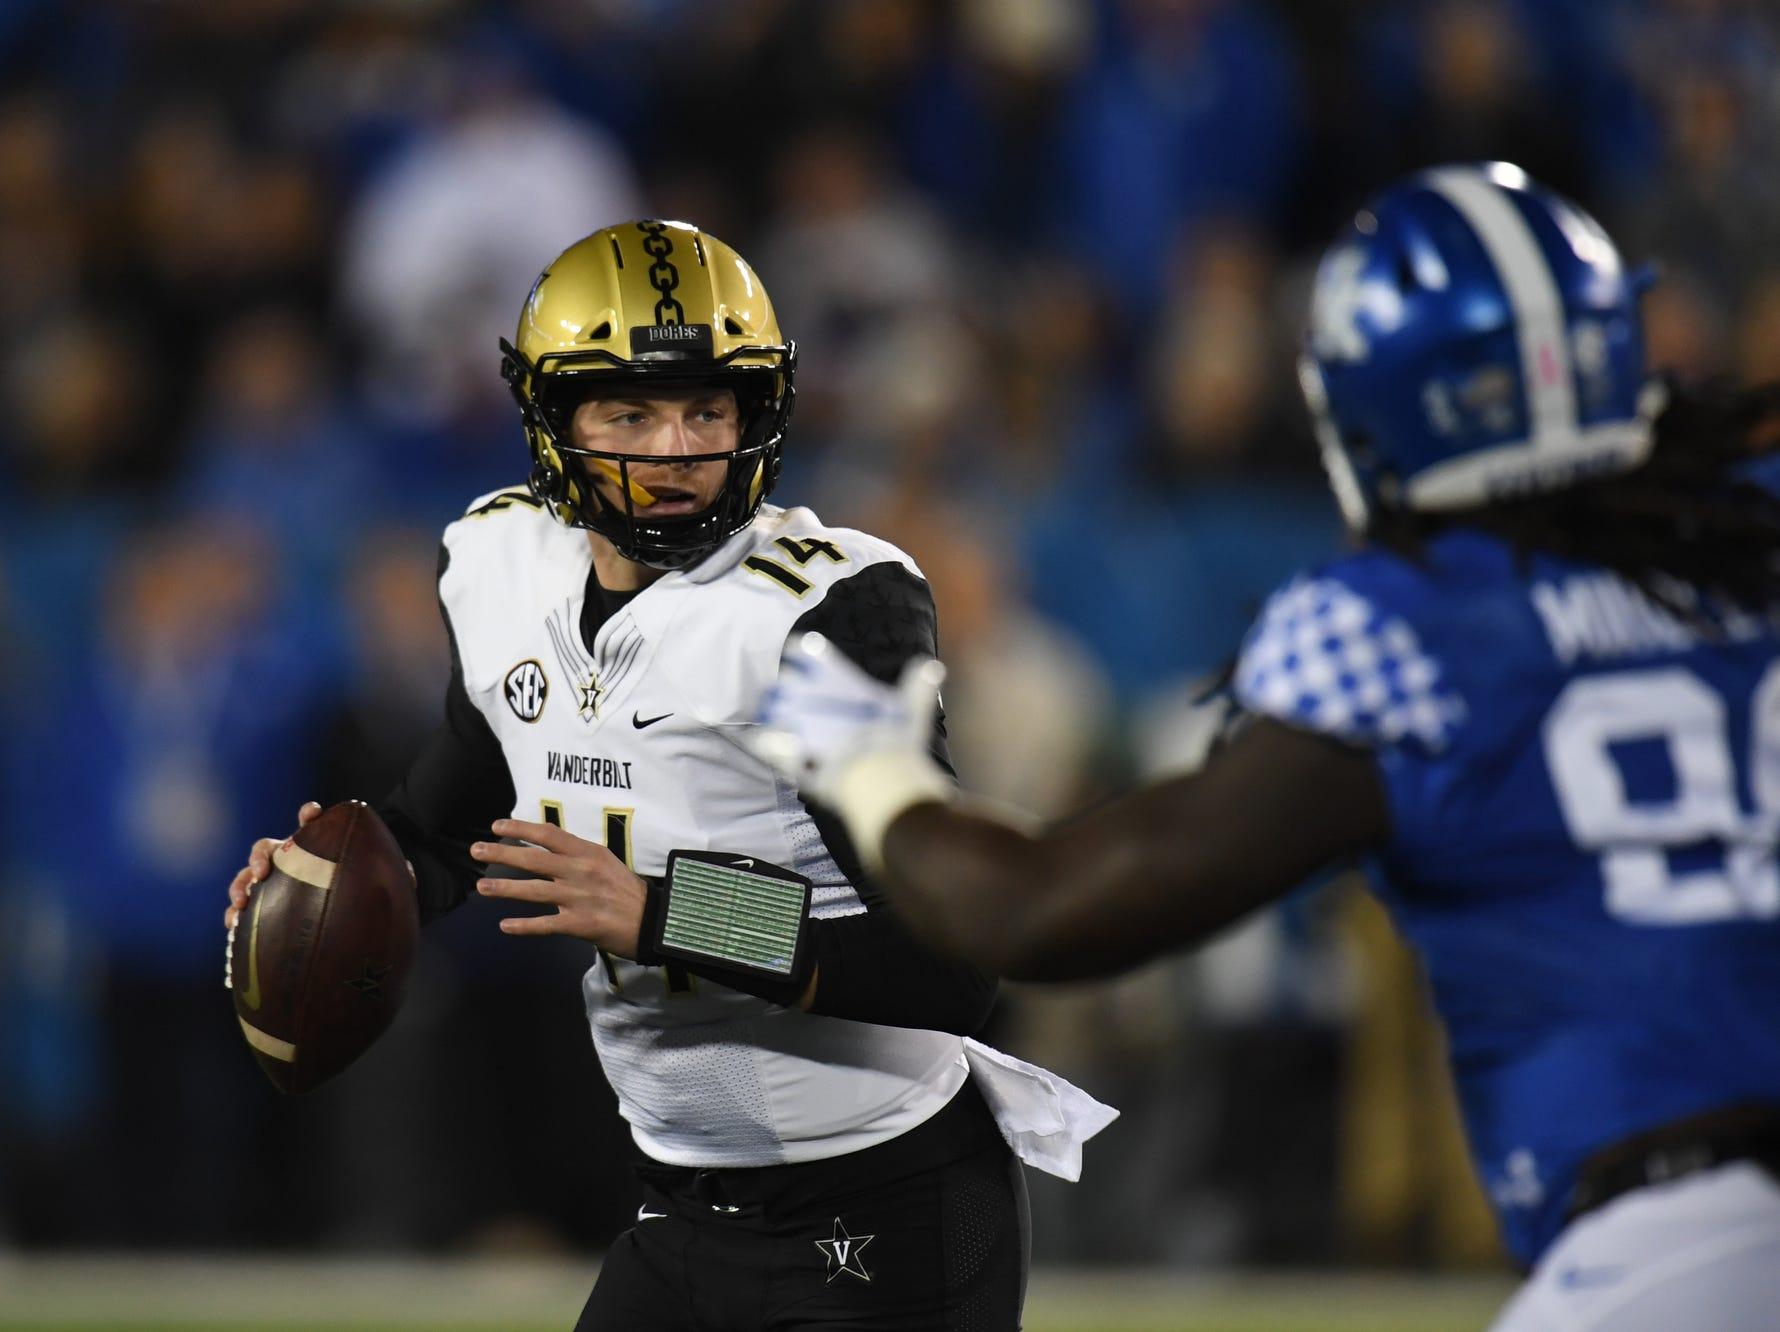 Vanderbilt QB Kyle Shurmur is pressured during the University of Kentucky football game against Vanderbilt at Kroger Field in Lexington, Kentucky on Saturday, October 20, 2018.